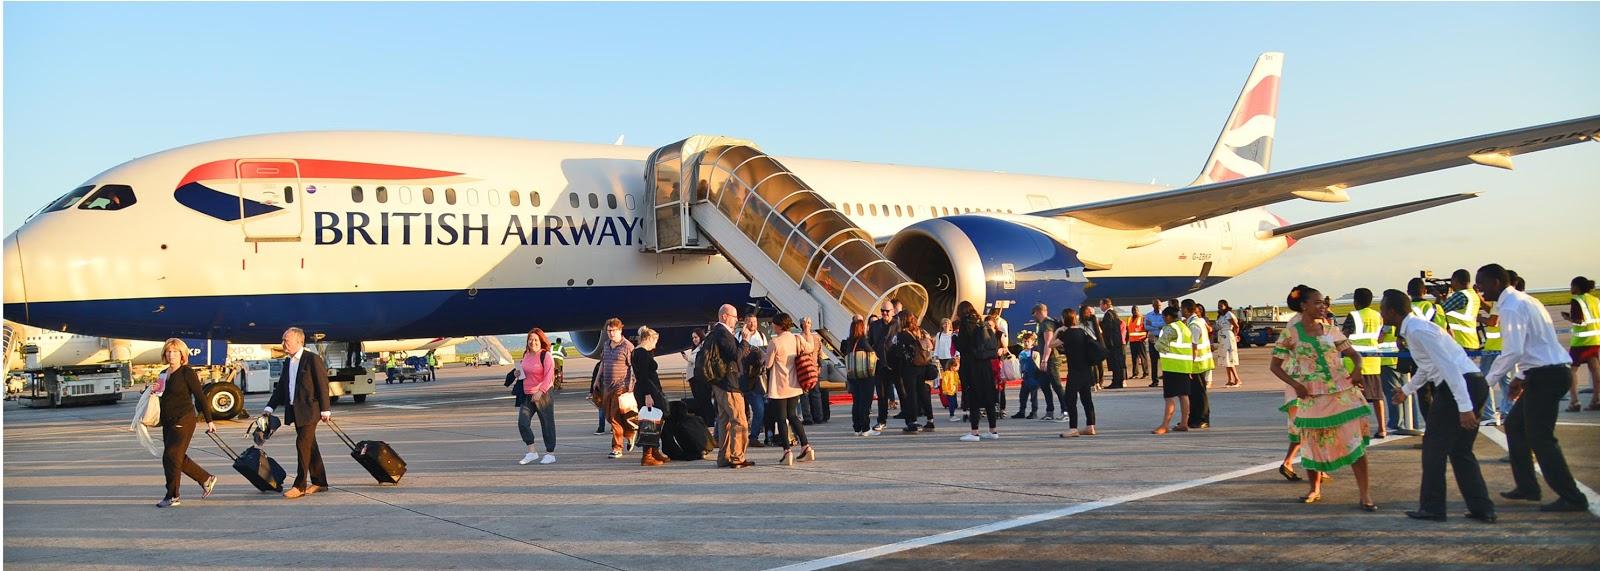 Airline News: British Airways - Mason's Travel